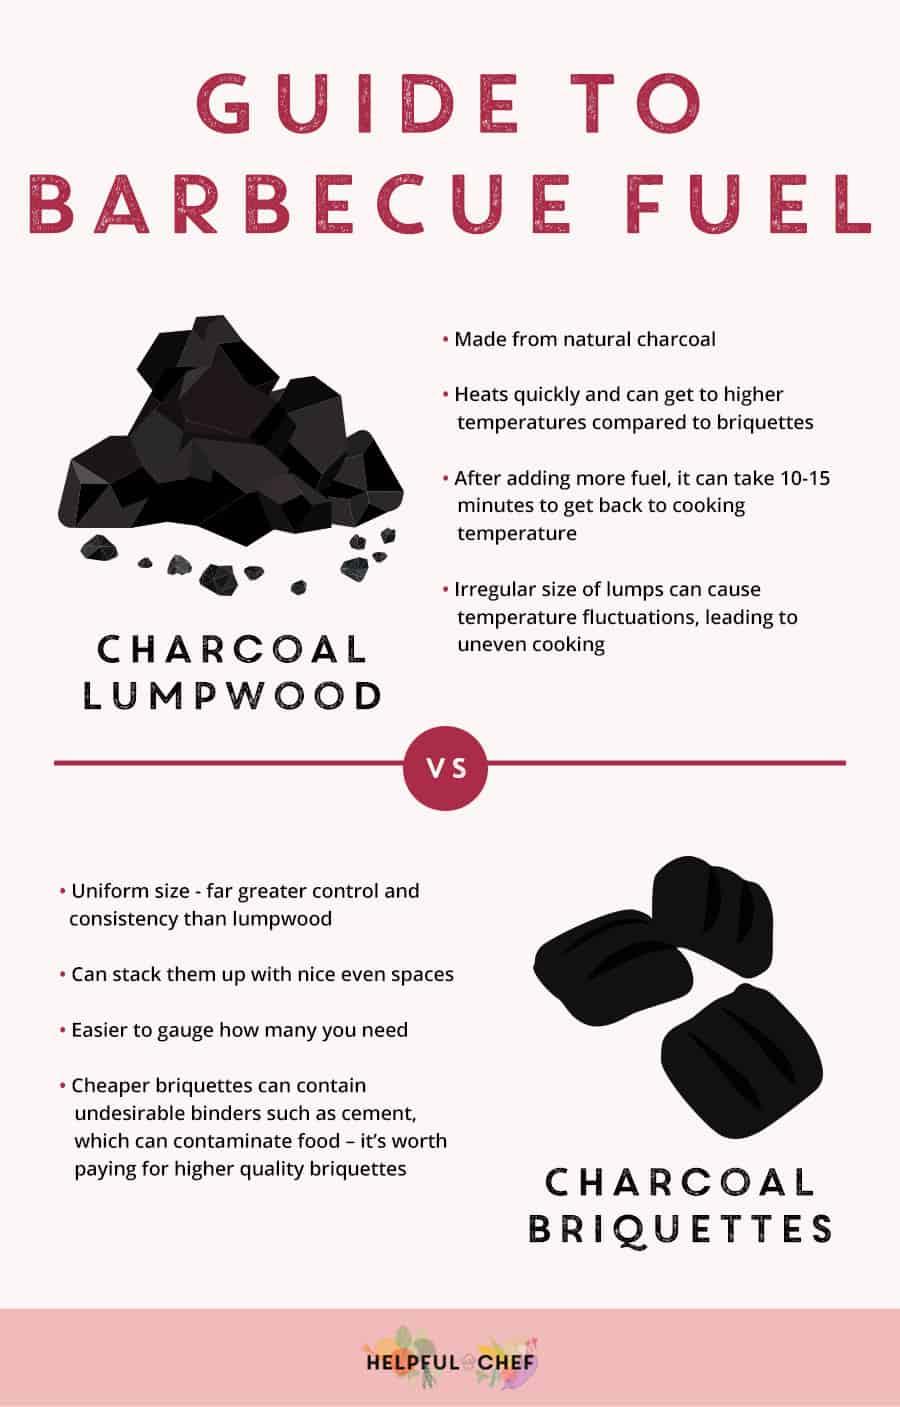 Guide to BBQ Fuel lumpwood charcoal v briquettes